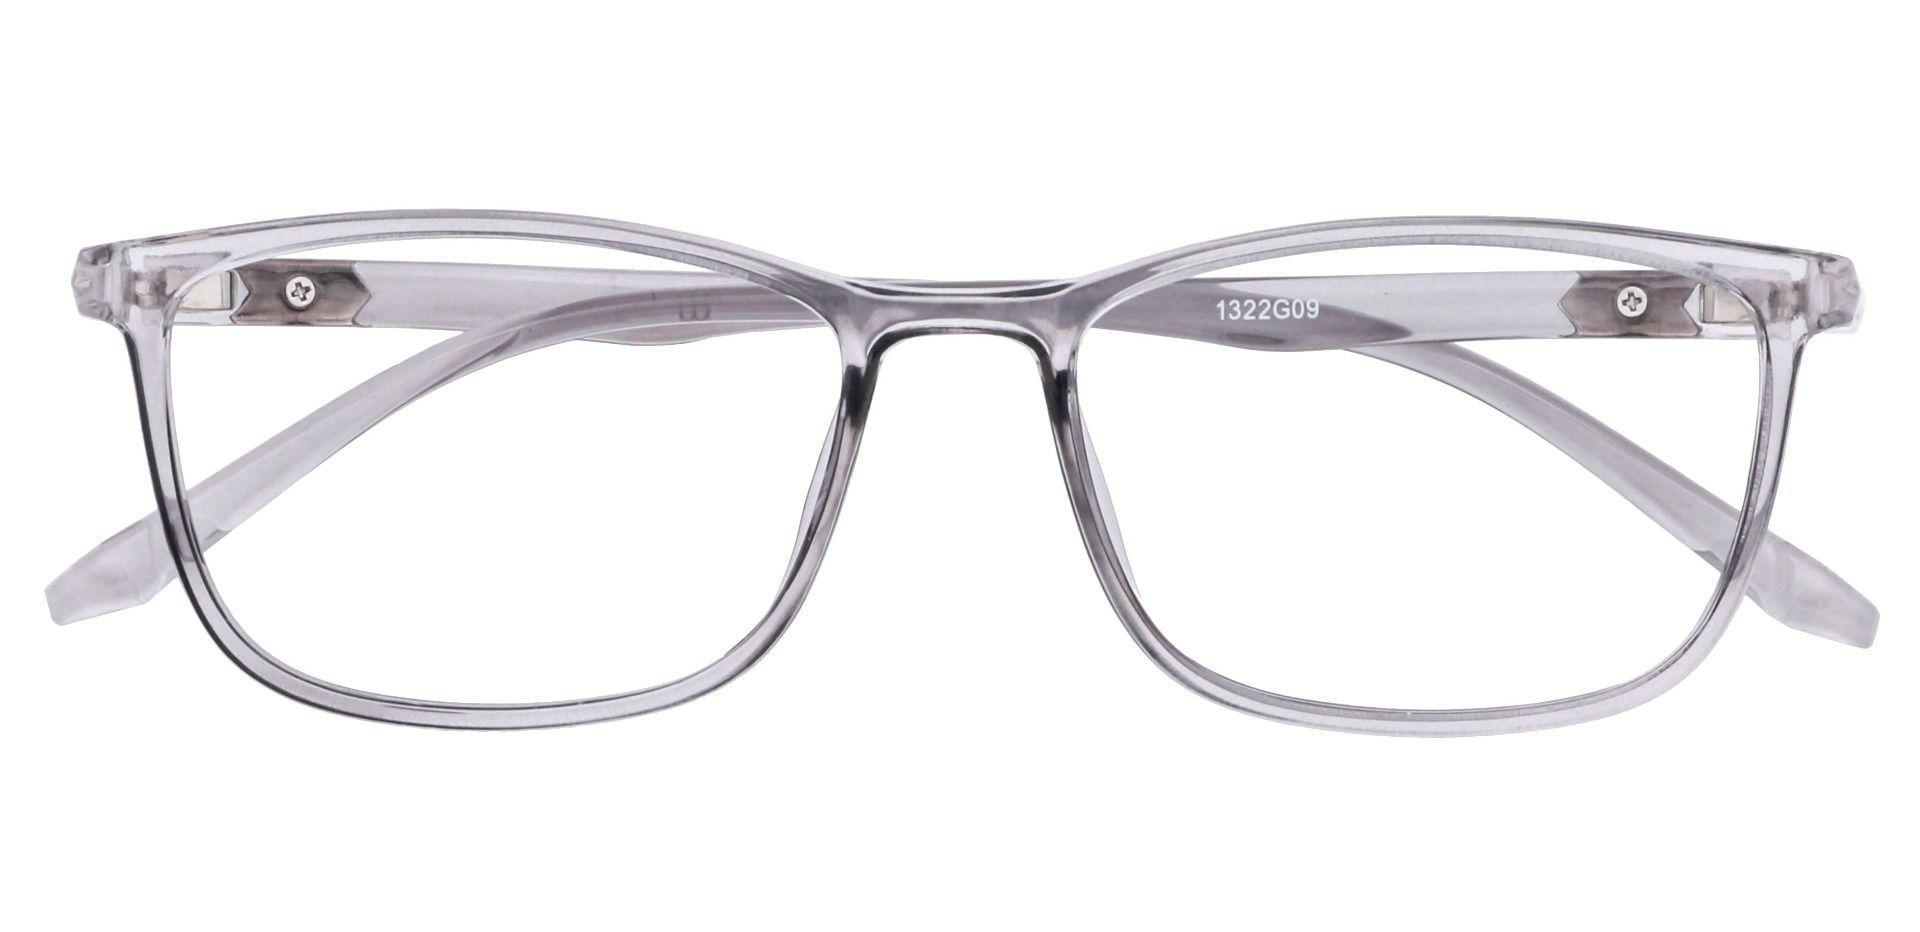 Harvest Rectangle Progressive Glasses - Gray